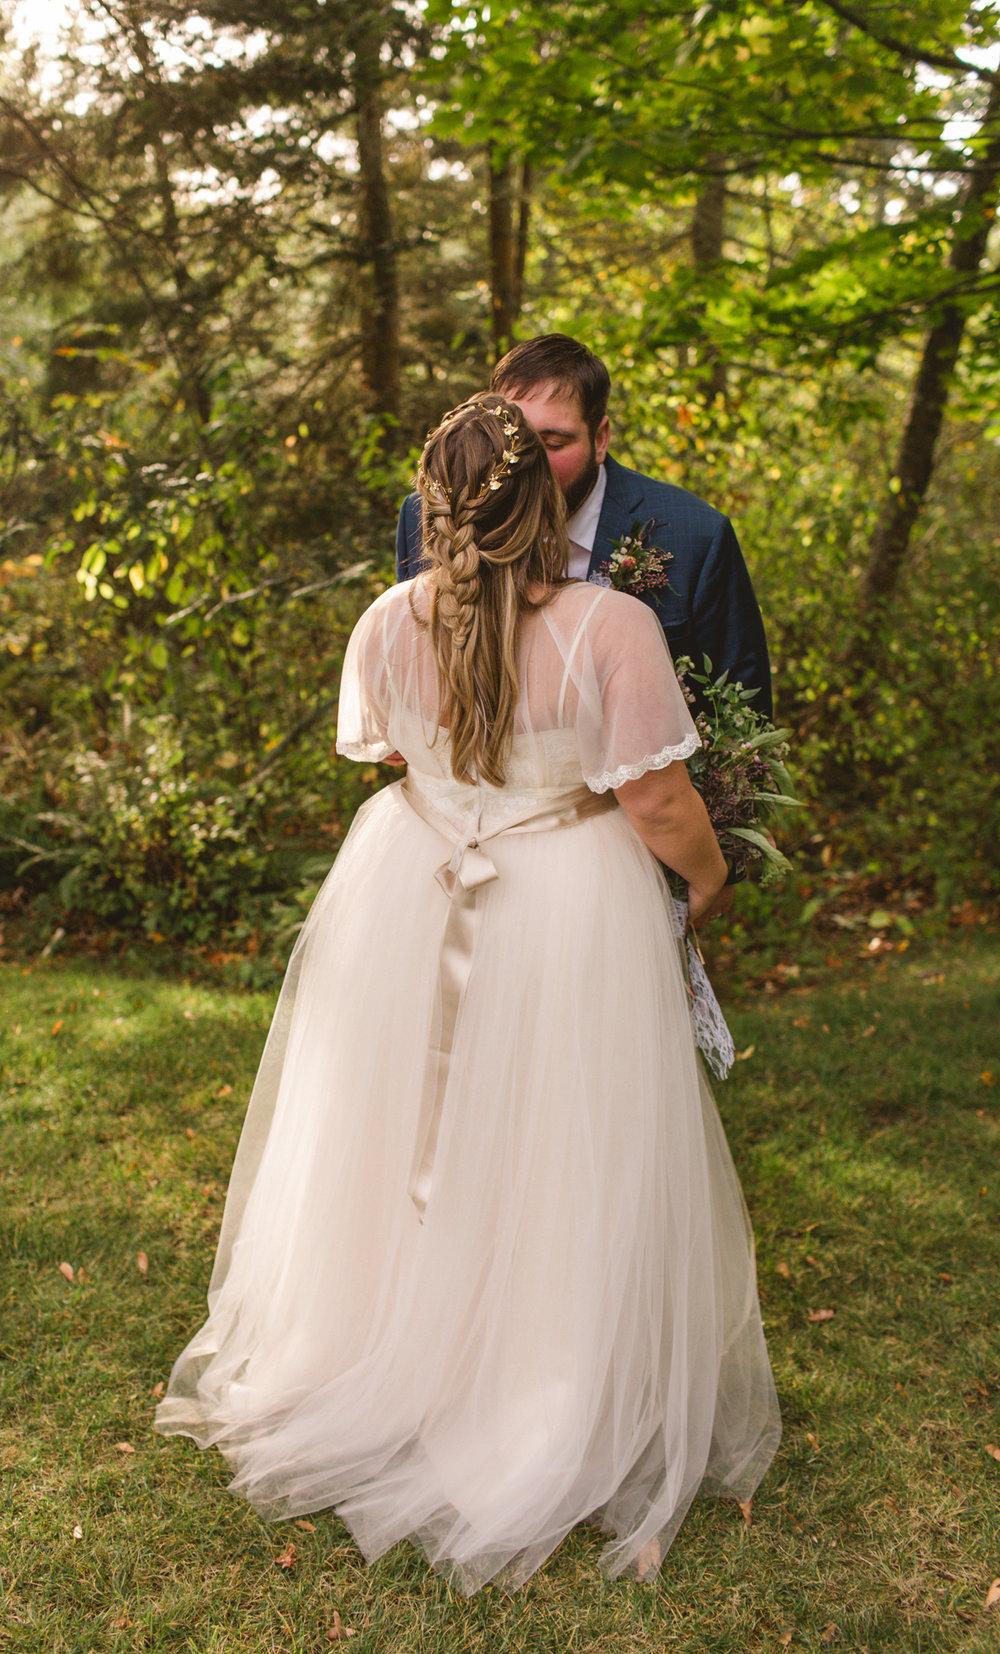 Brandi & Chad's Wedding-134.jpg